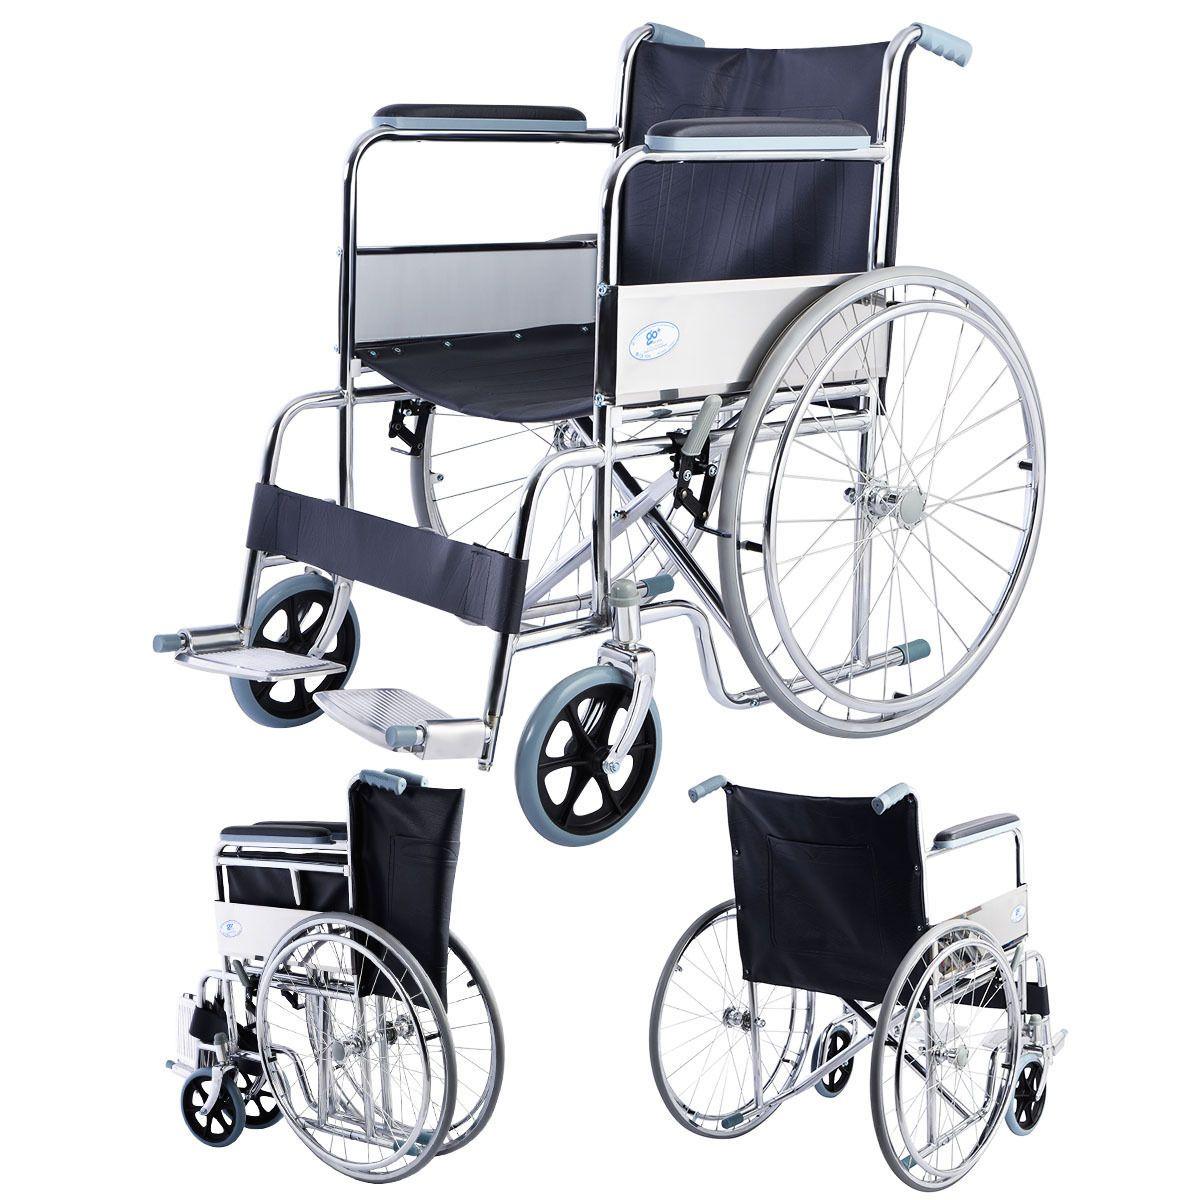 20 Days Presell 24 Lightweight Foldable Folding Wheelchair W Swingaway Footrest Manual Wheelchair Lightweight Folding Wheelchair Wheelchair